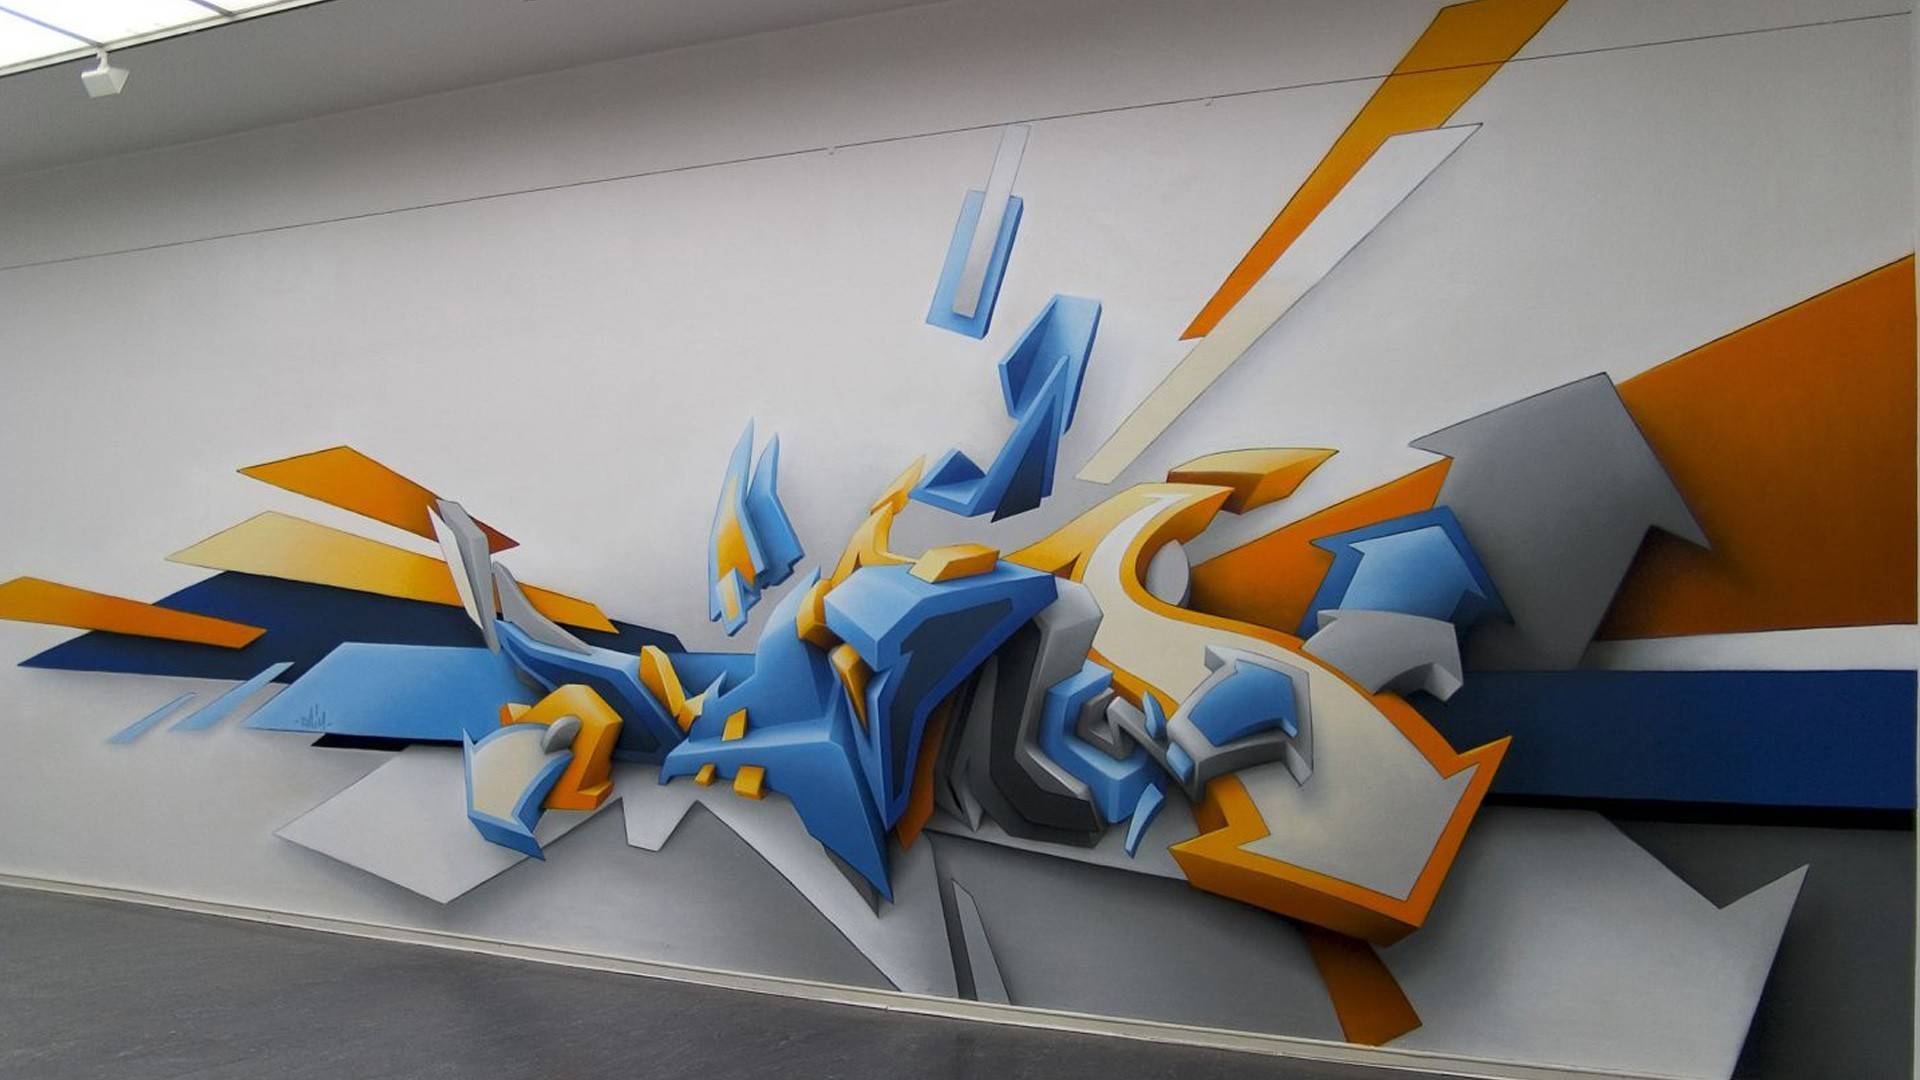 Abstract Graffiti Wallpapers Wallpaper Cave